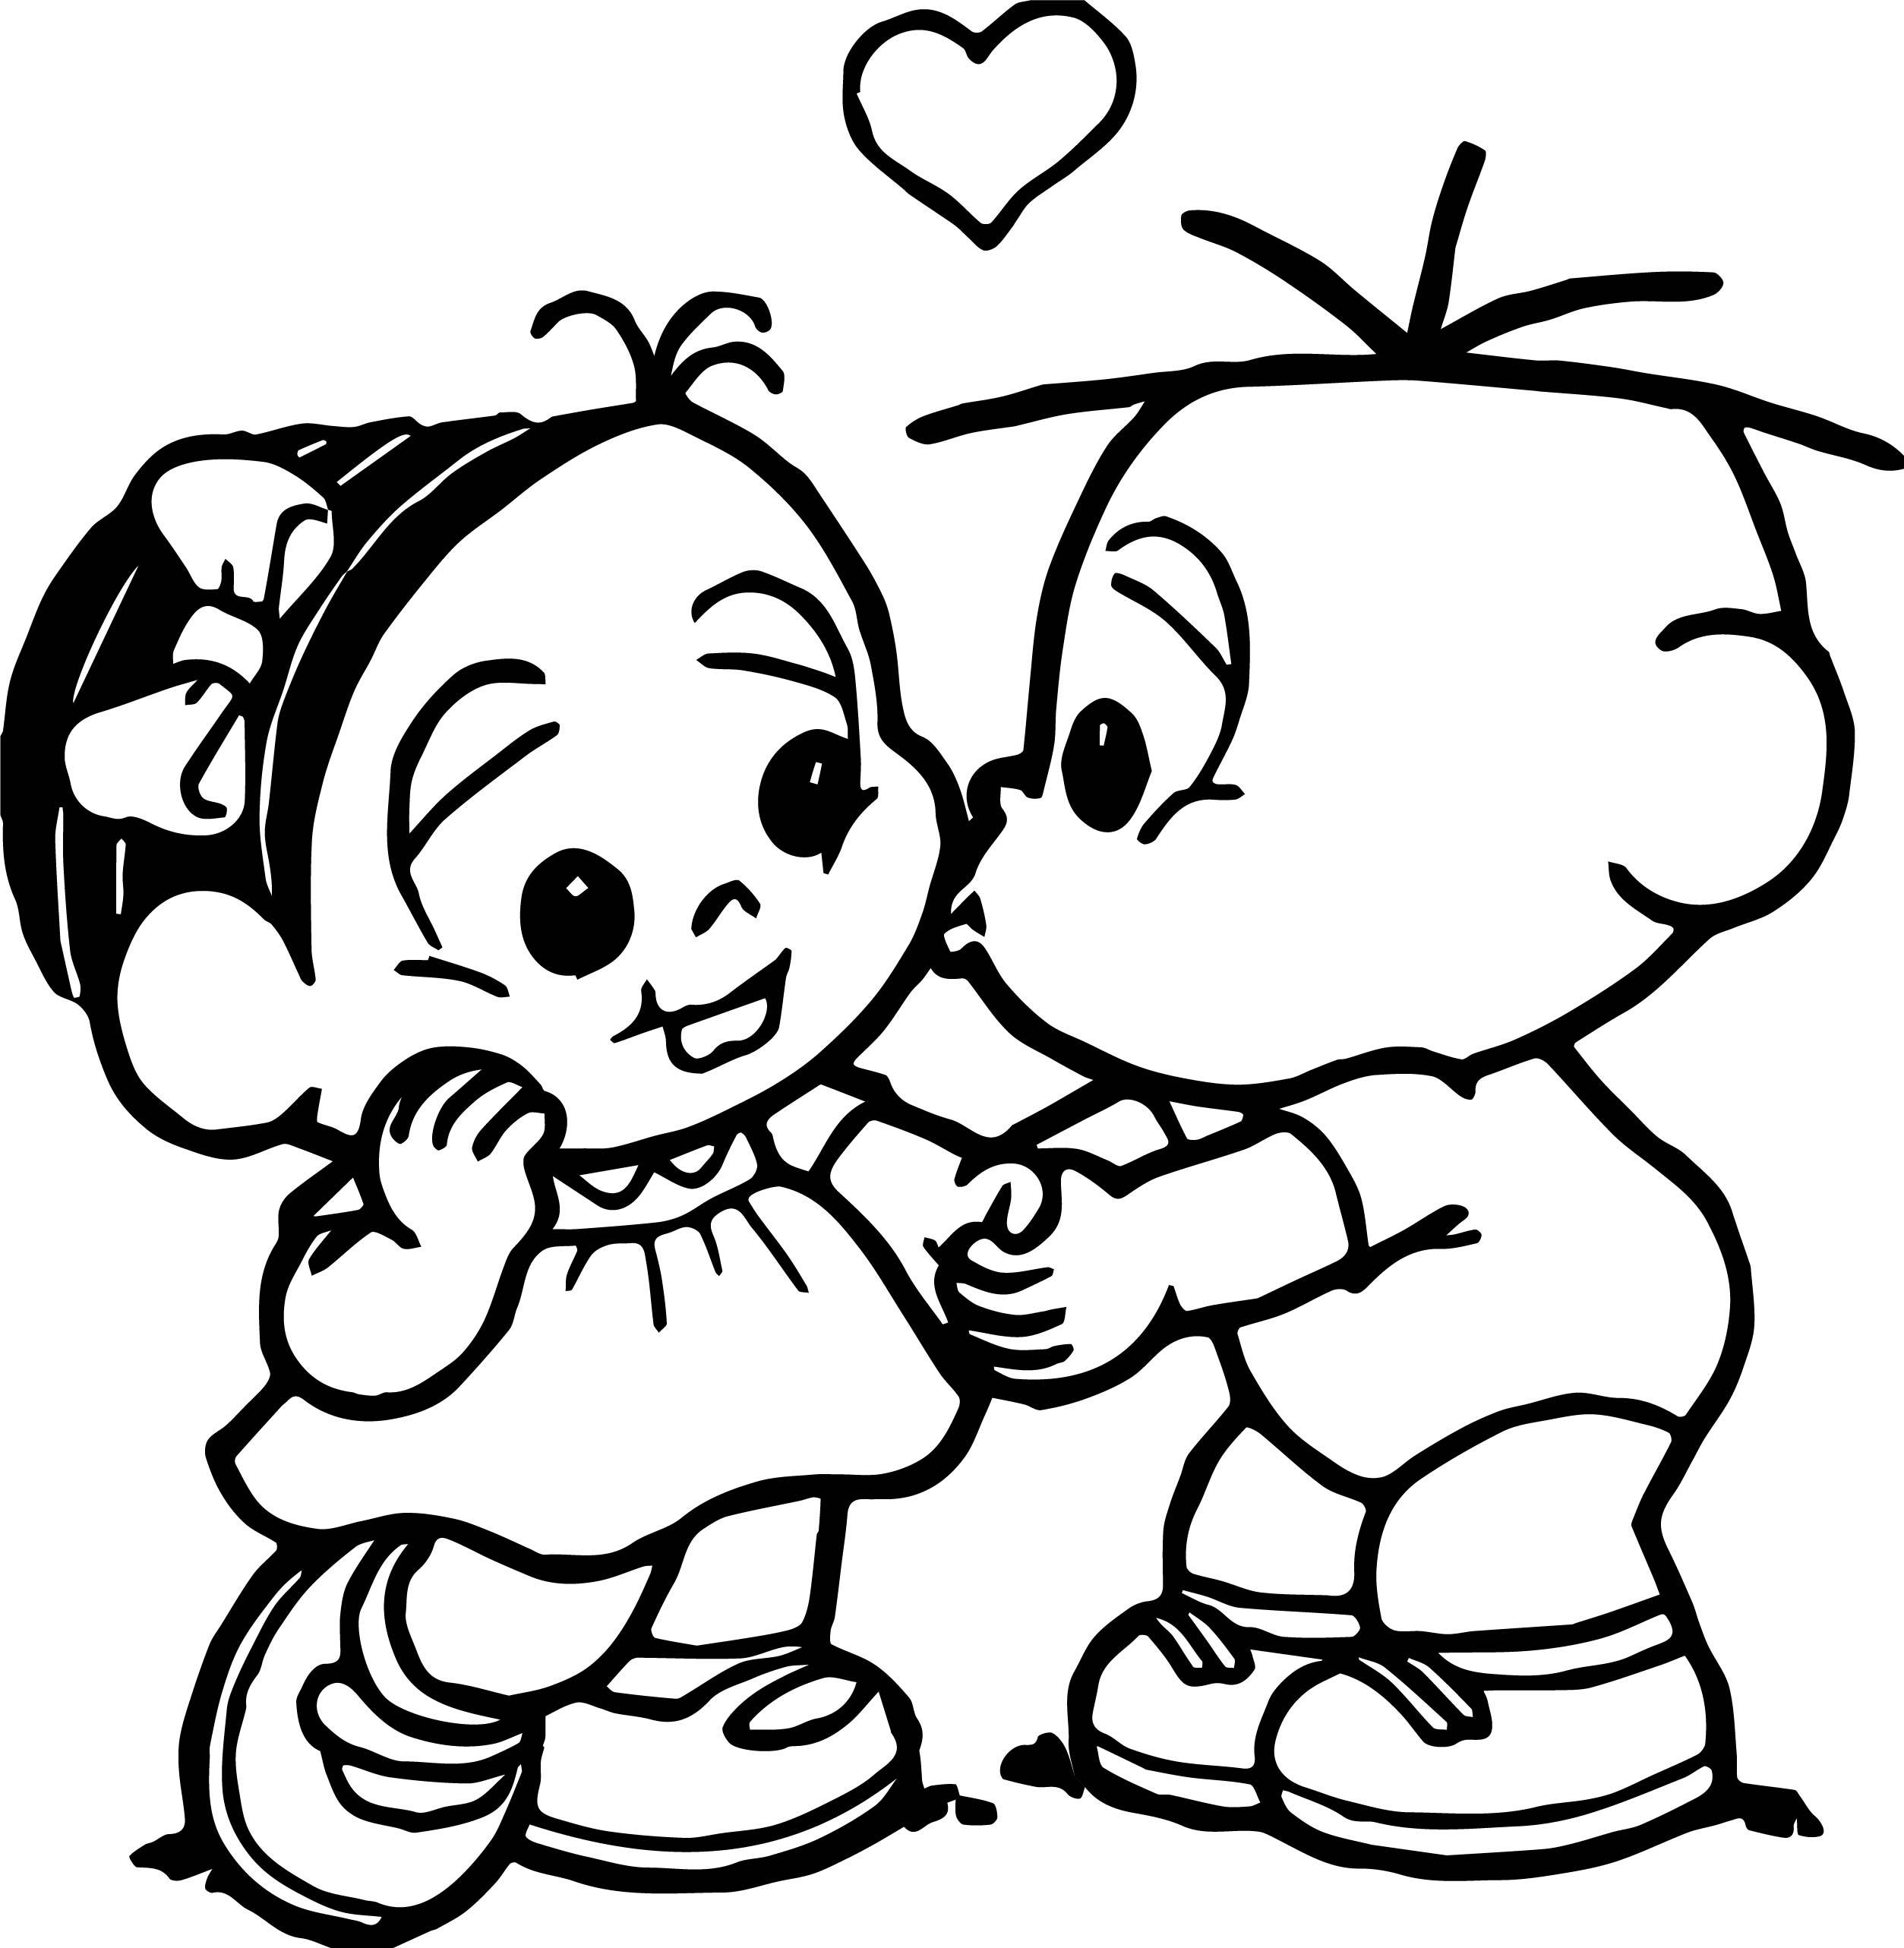 Turma Da Monica Baby Kiss Coloring Page Wecoloringpage